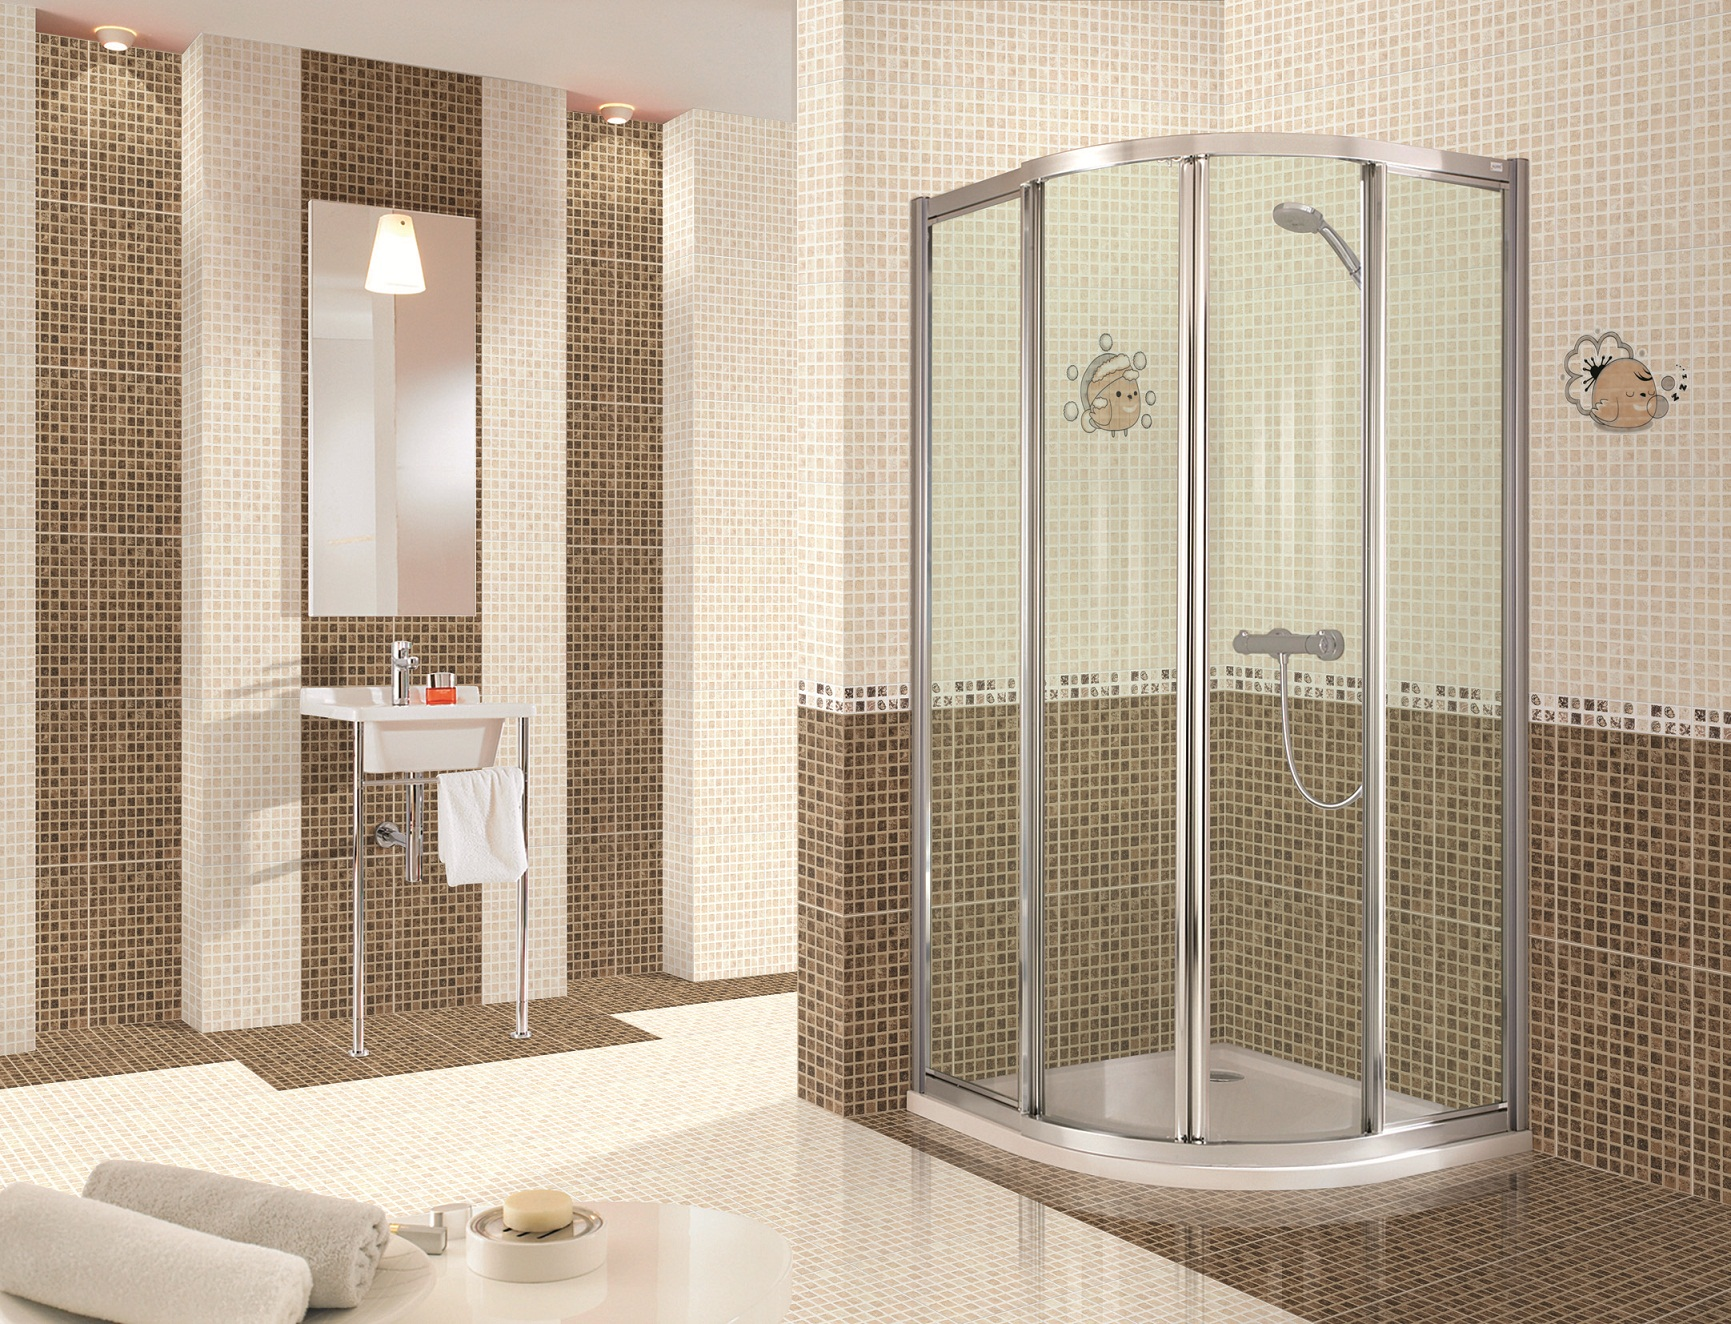 Bathroom tiles designs 2016 - Ceramic Wall Tile Design Brilliant With Interesting Bathroom Decorating Ideas New Trendy Washroom Designs With Tiled